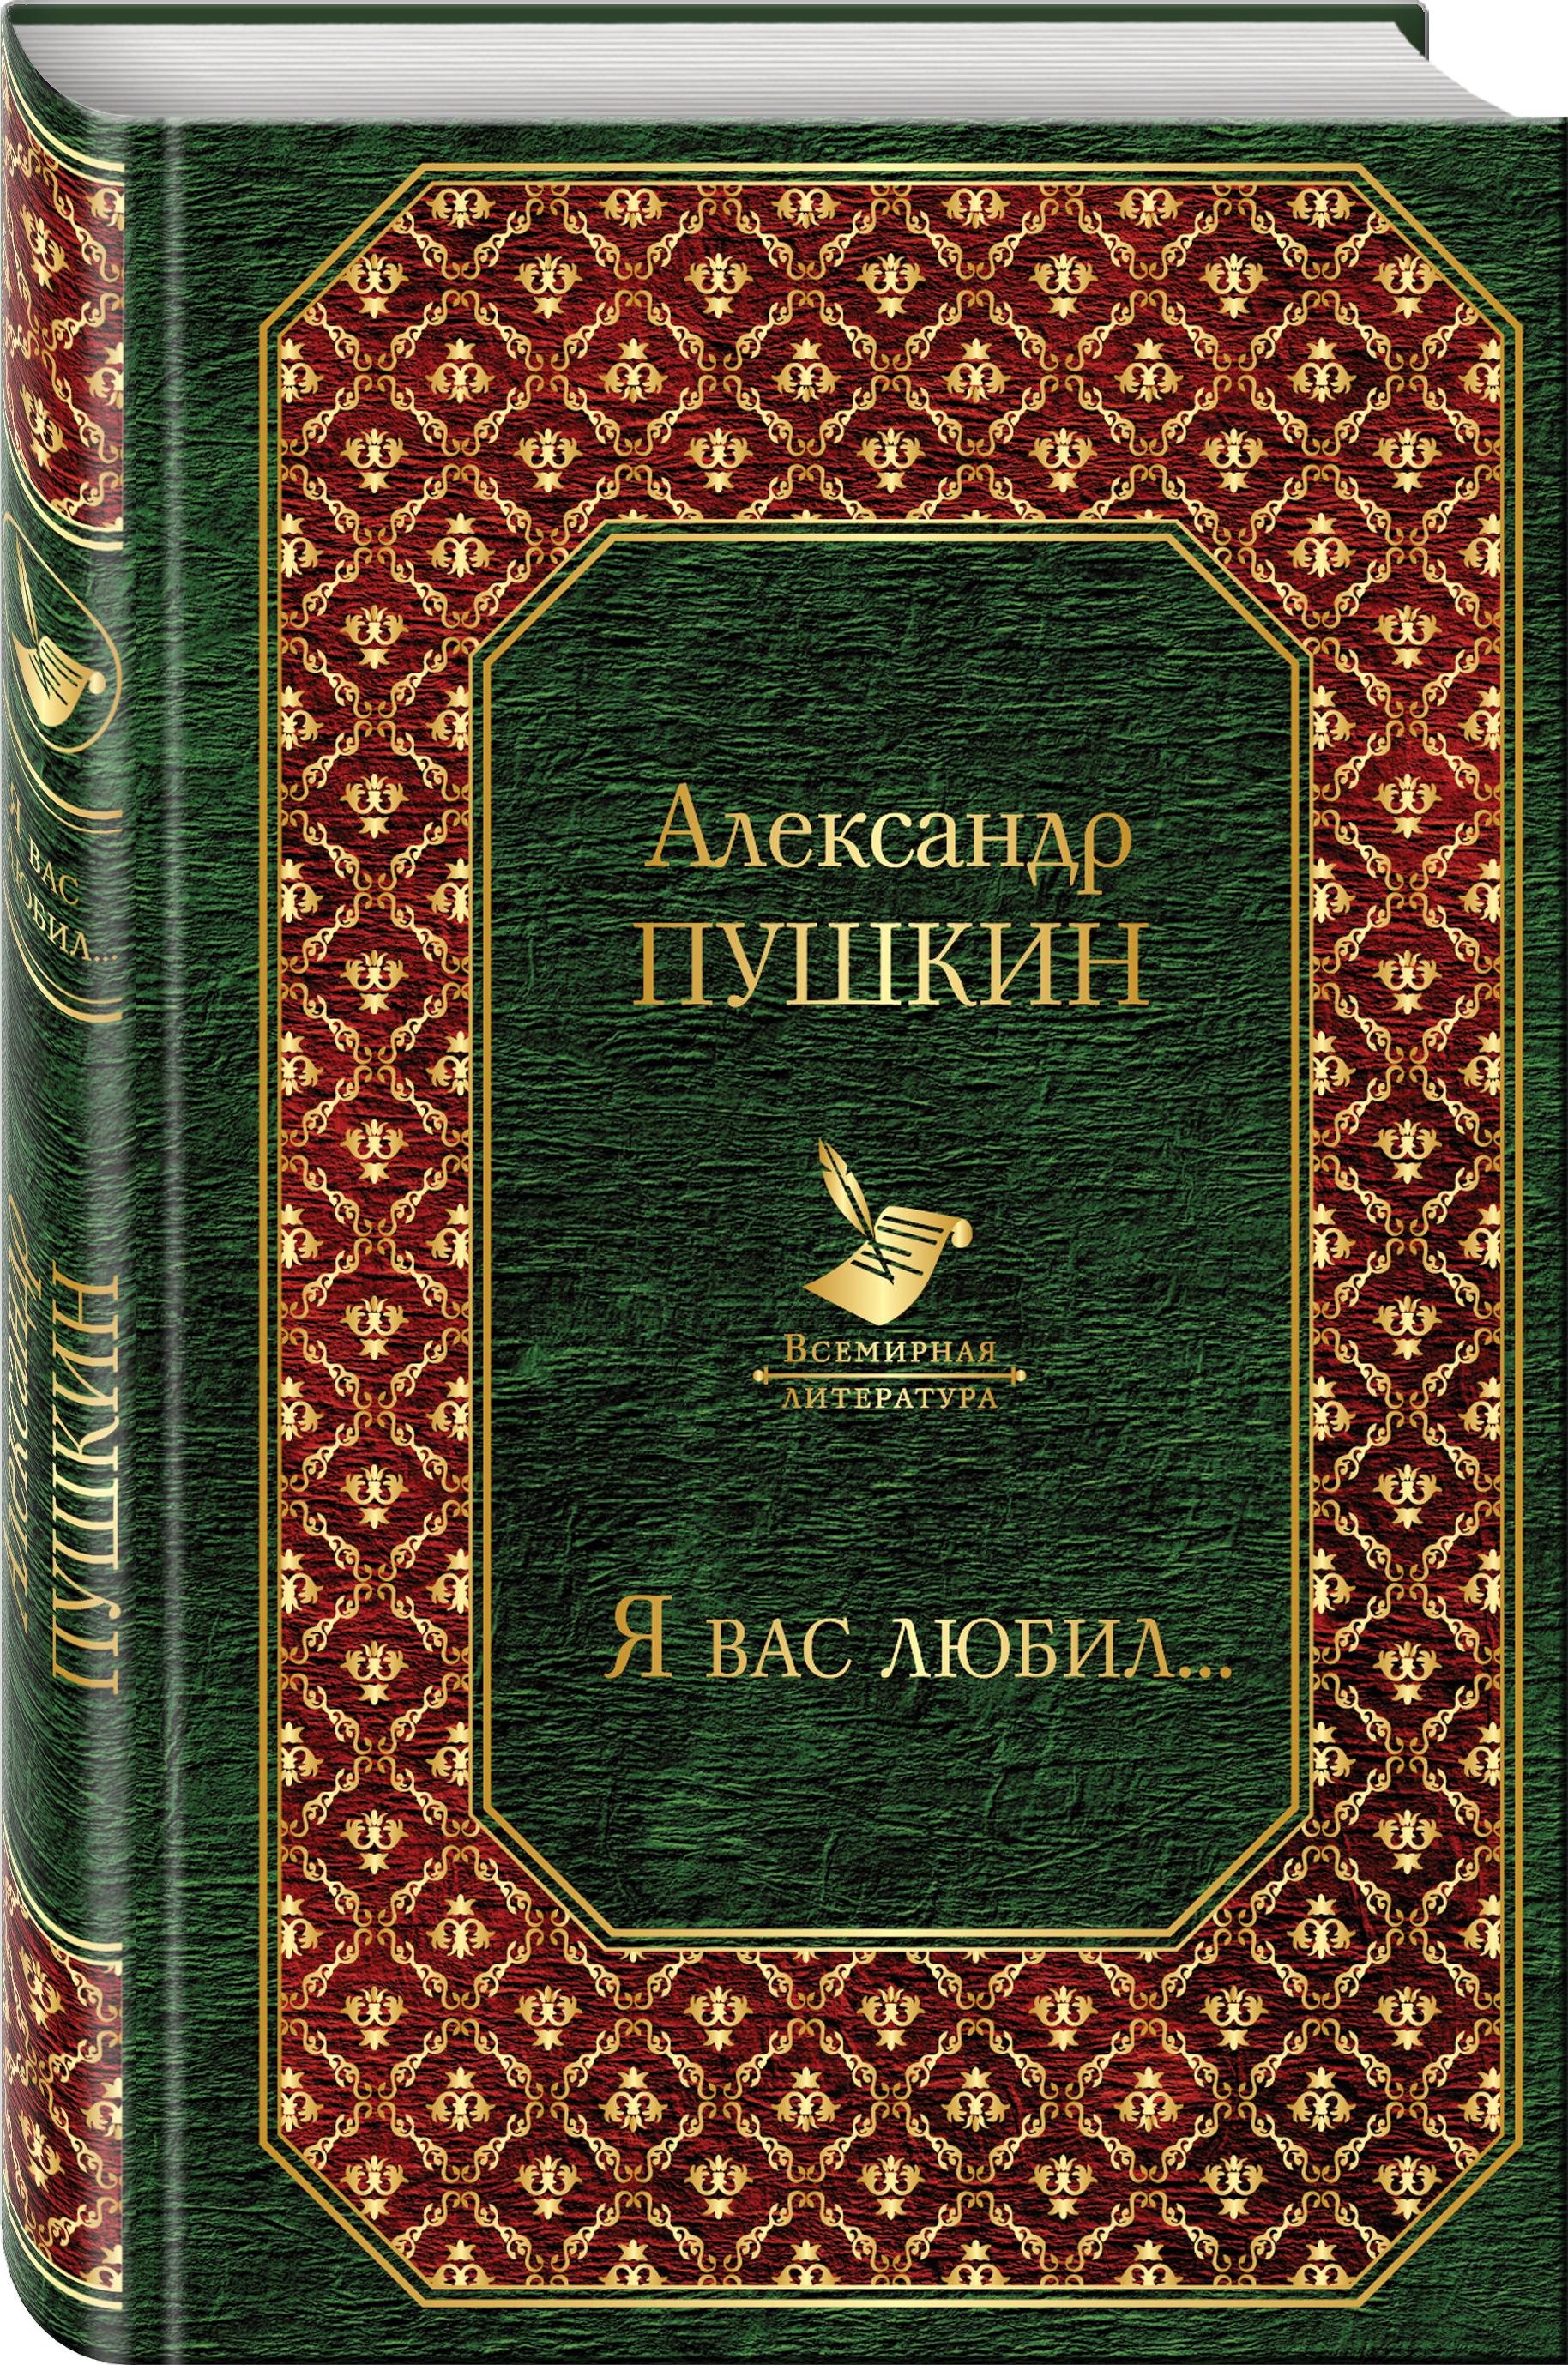 Я вас любил... ( Пушкин Александр Сергеевич  )